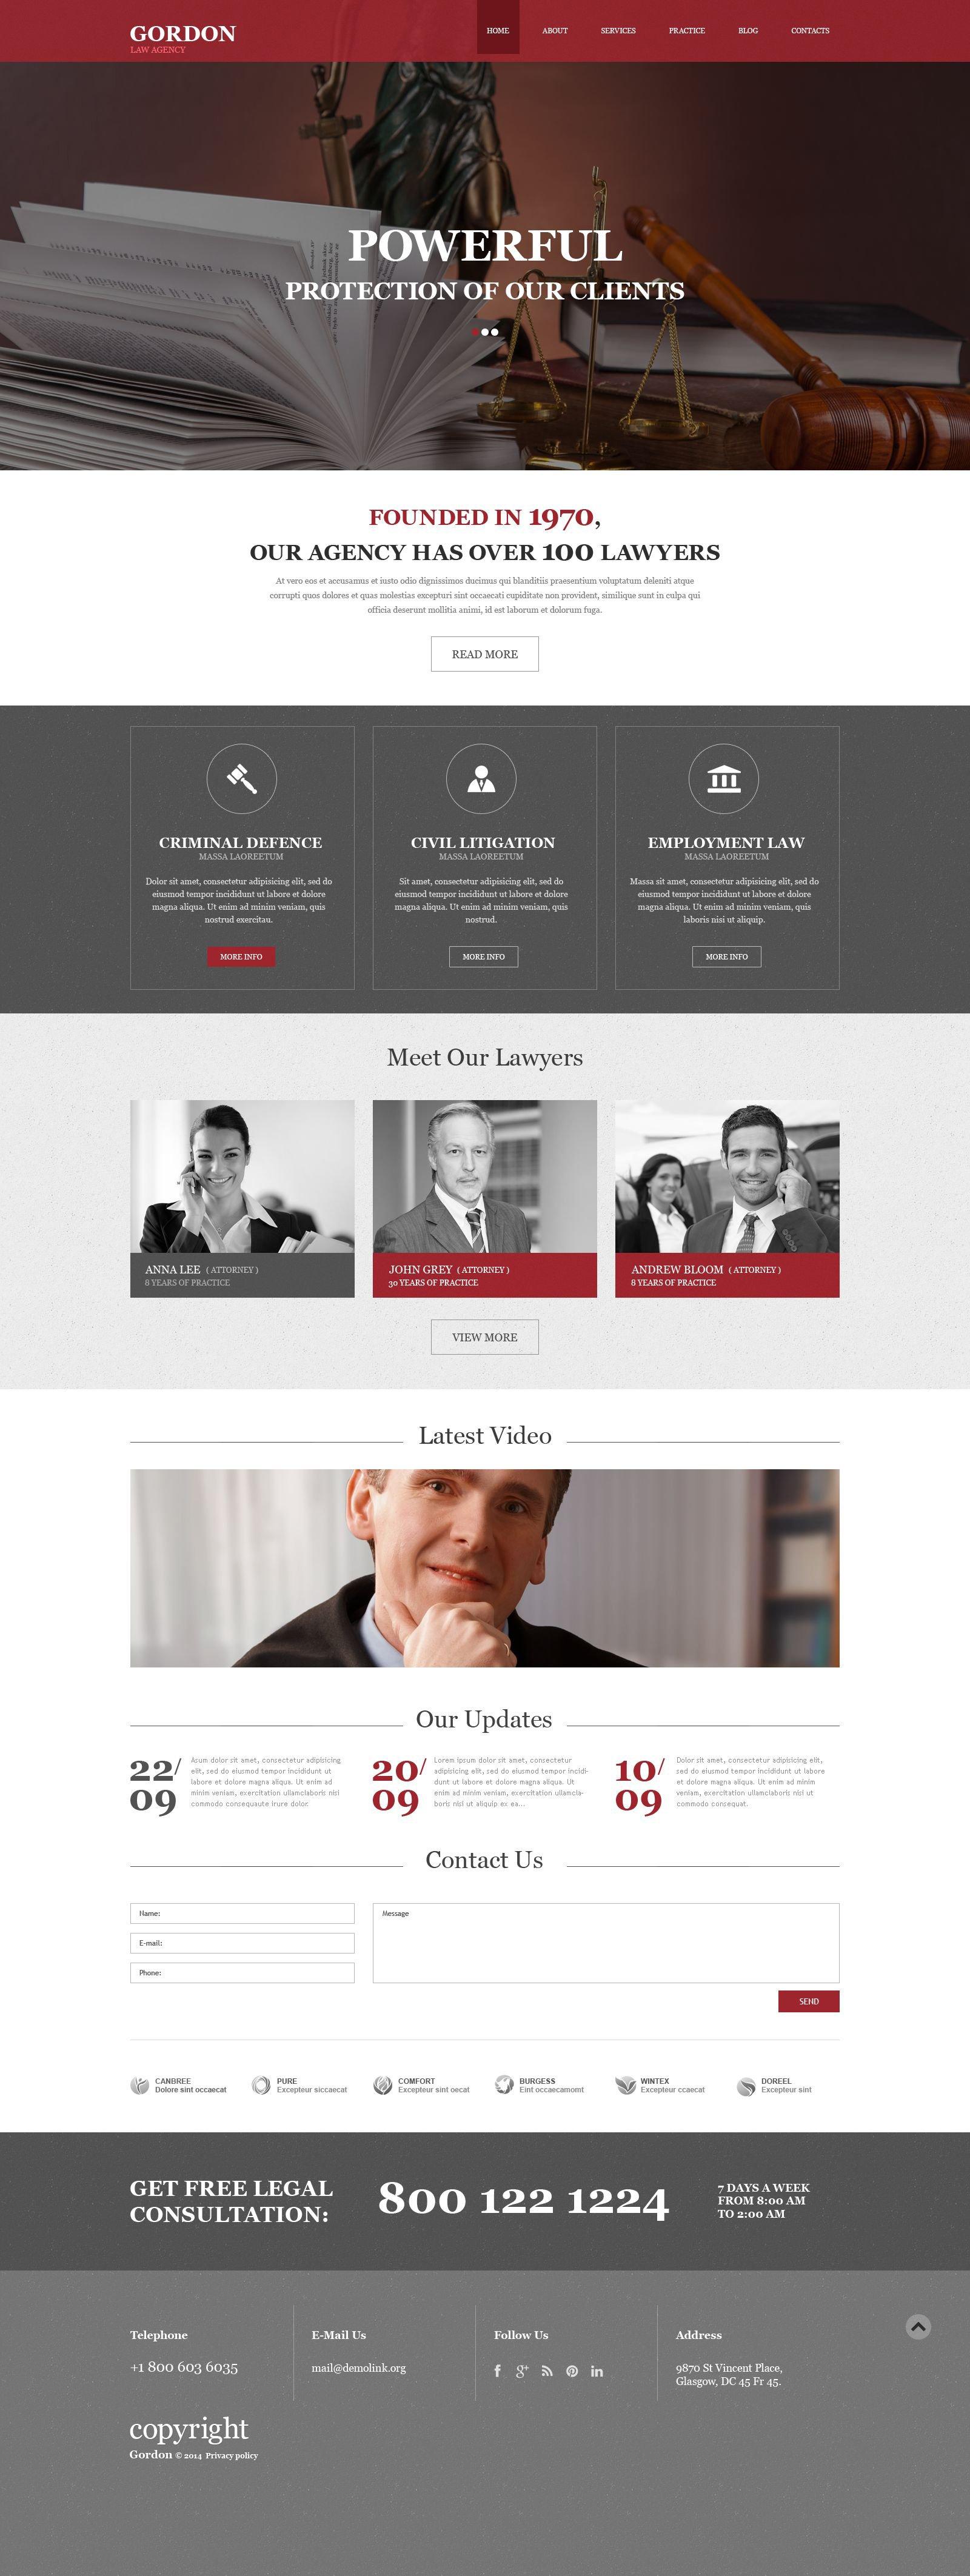 Muse шаблон на тему юридична фірма №52048 - скріншот